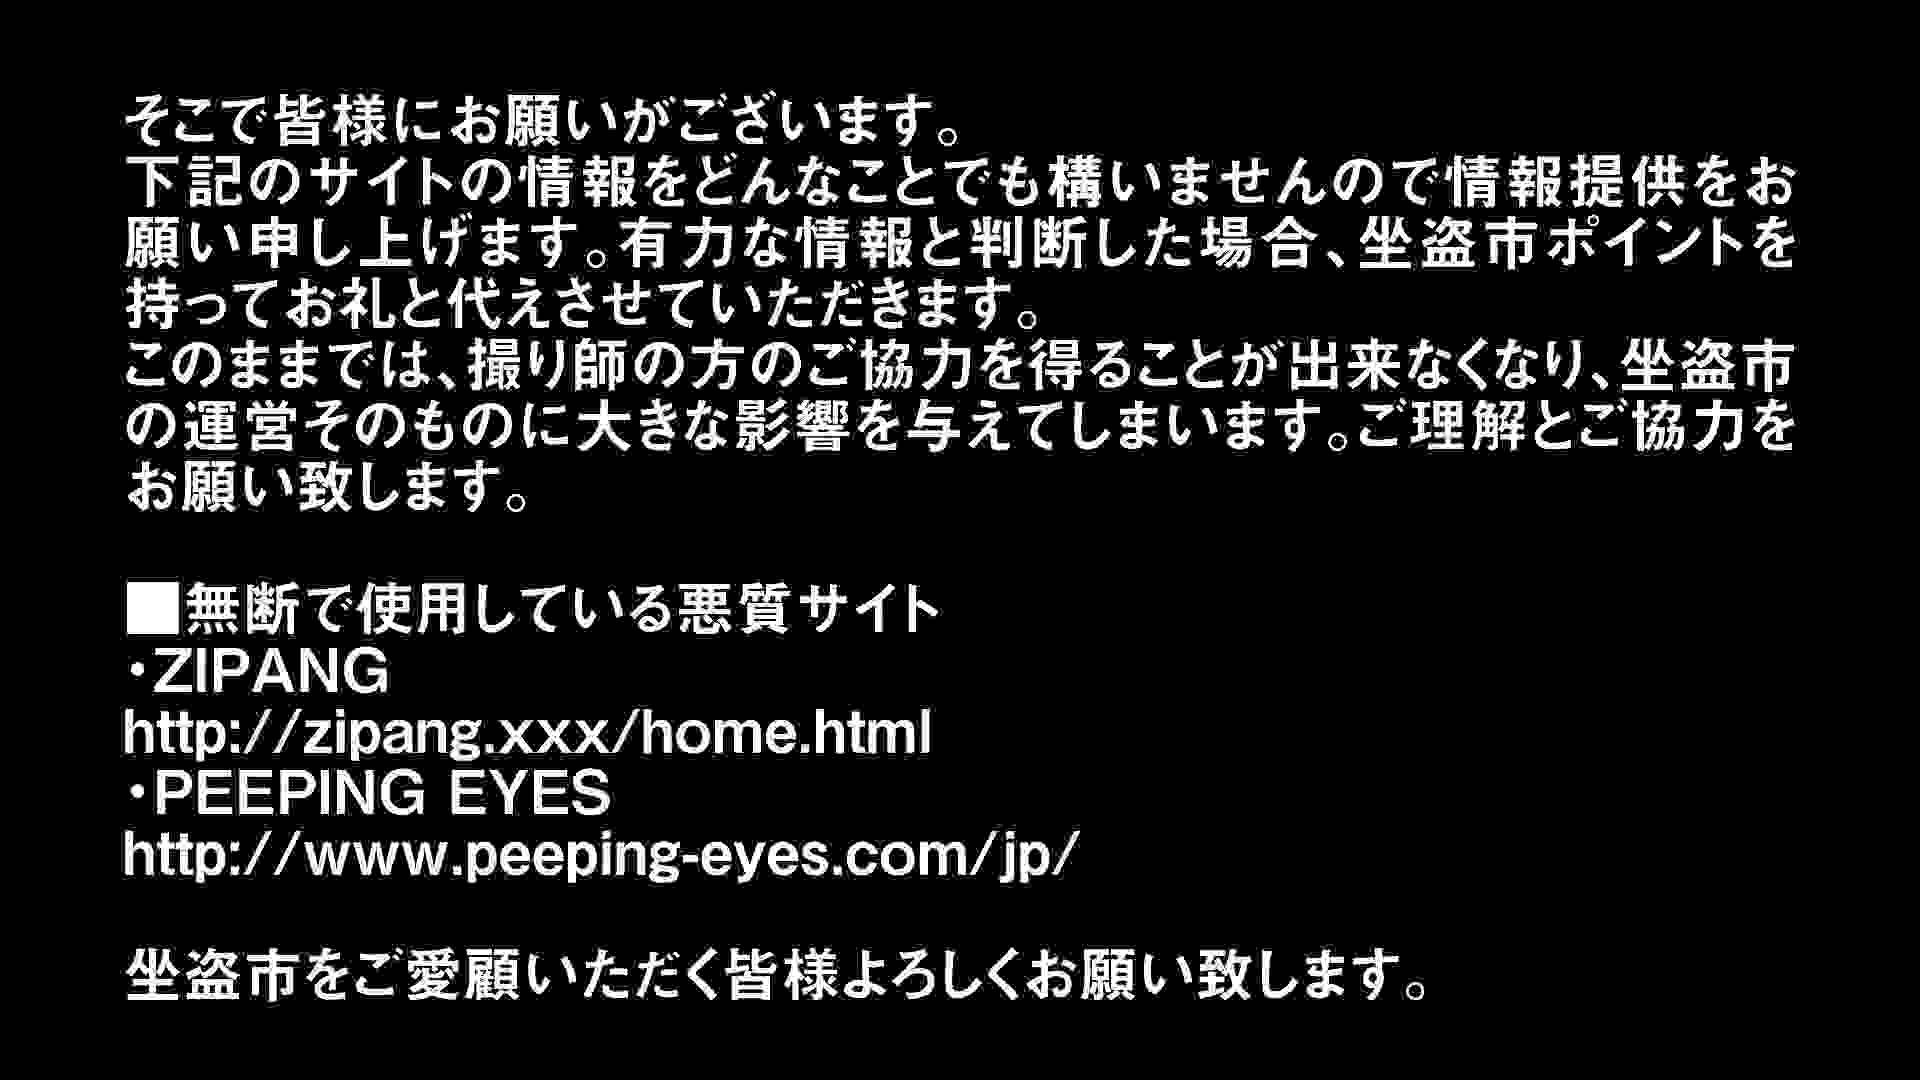 Aquaな露天風呂Vol.299 盗撮シリーズ | 露天風呂編  82PIX 23